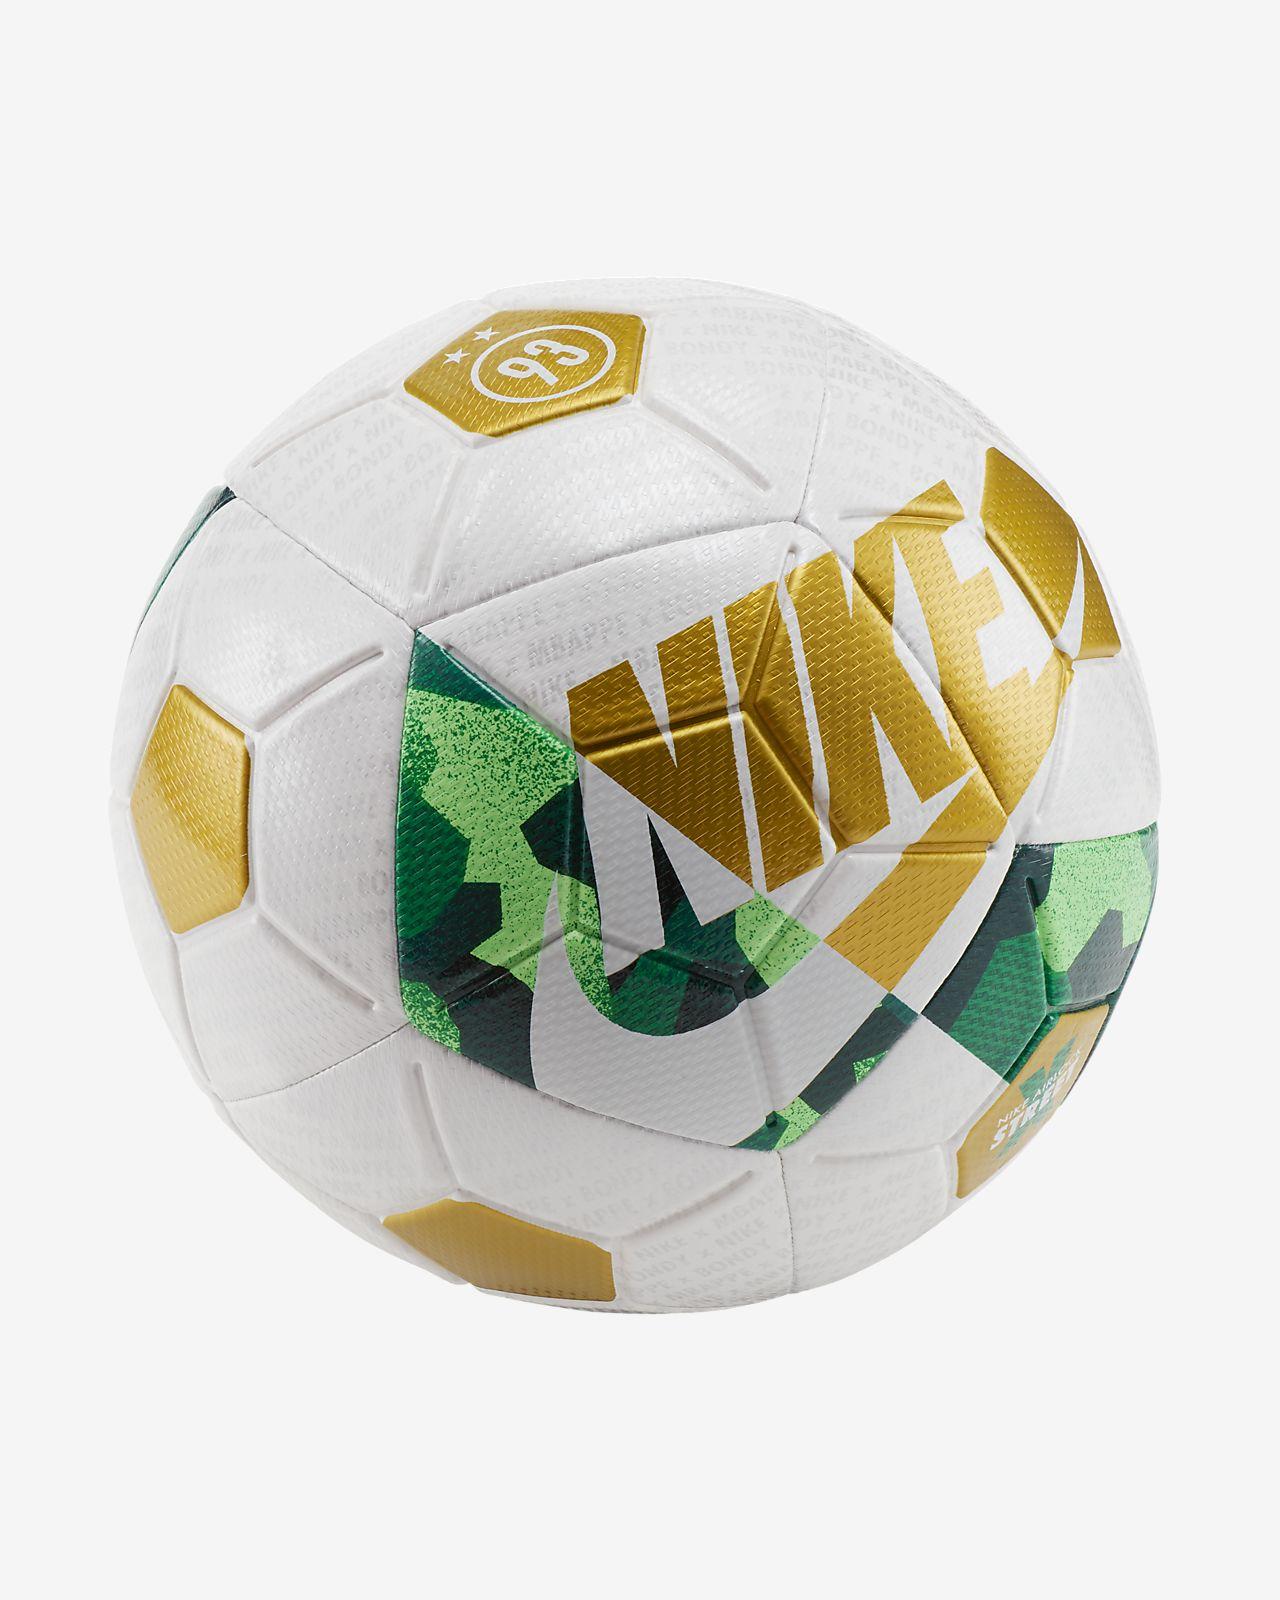 Футбольный мяч Nike Airlock Street X Bondy